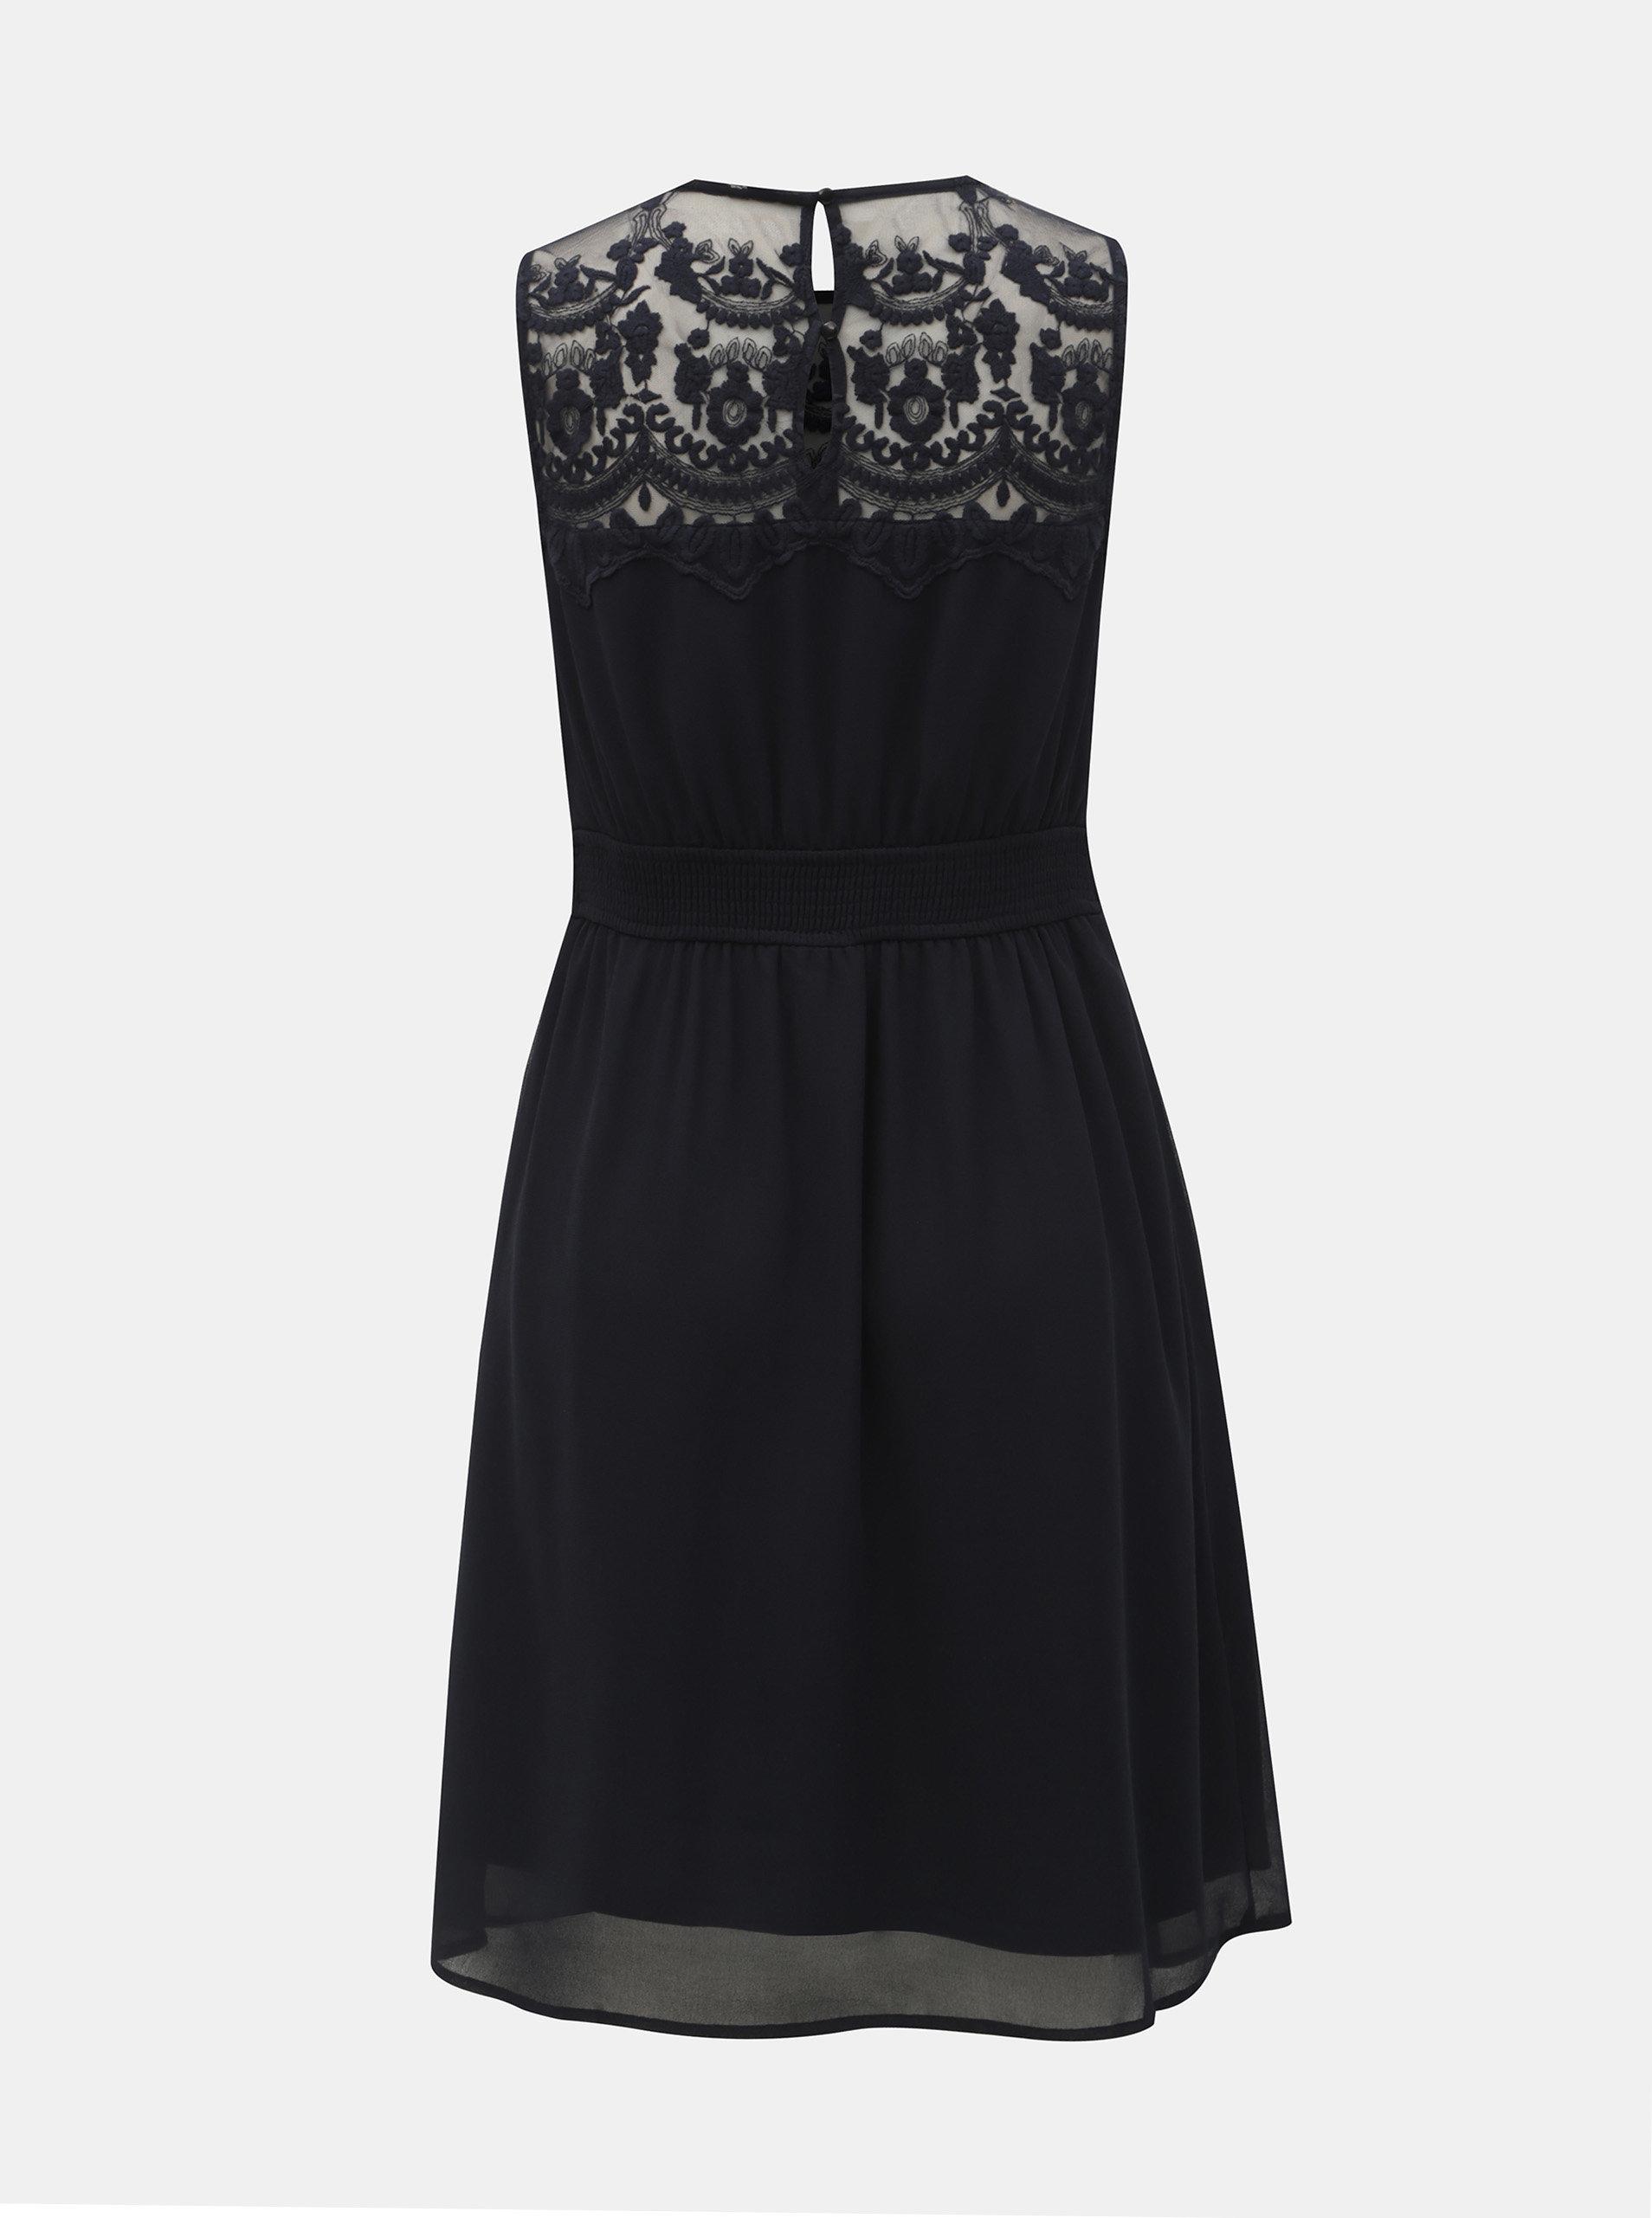 aeac68639439 Tmavomodré šaty s čipkou VERO MODA Vanessa ...